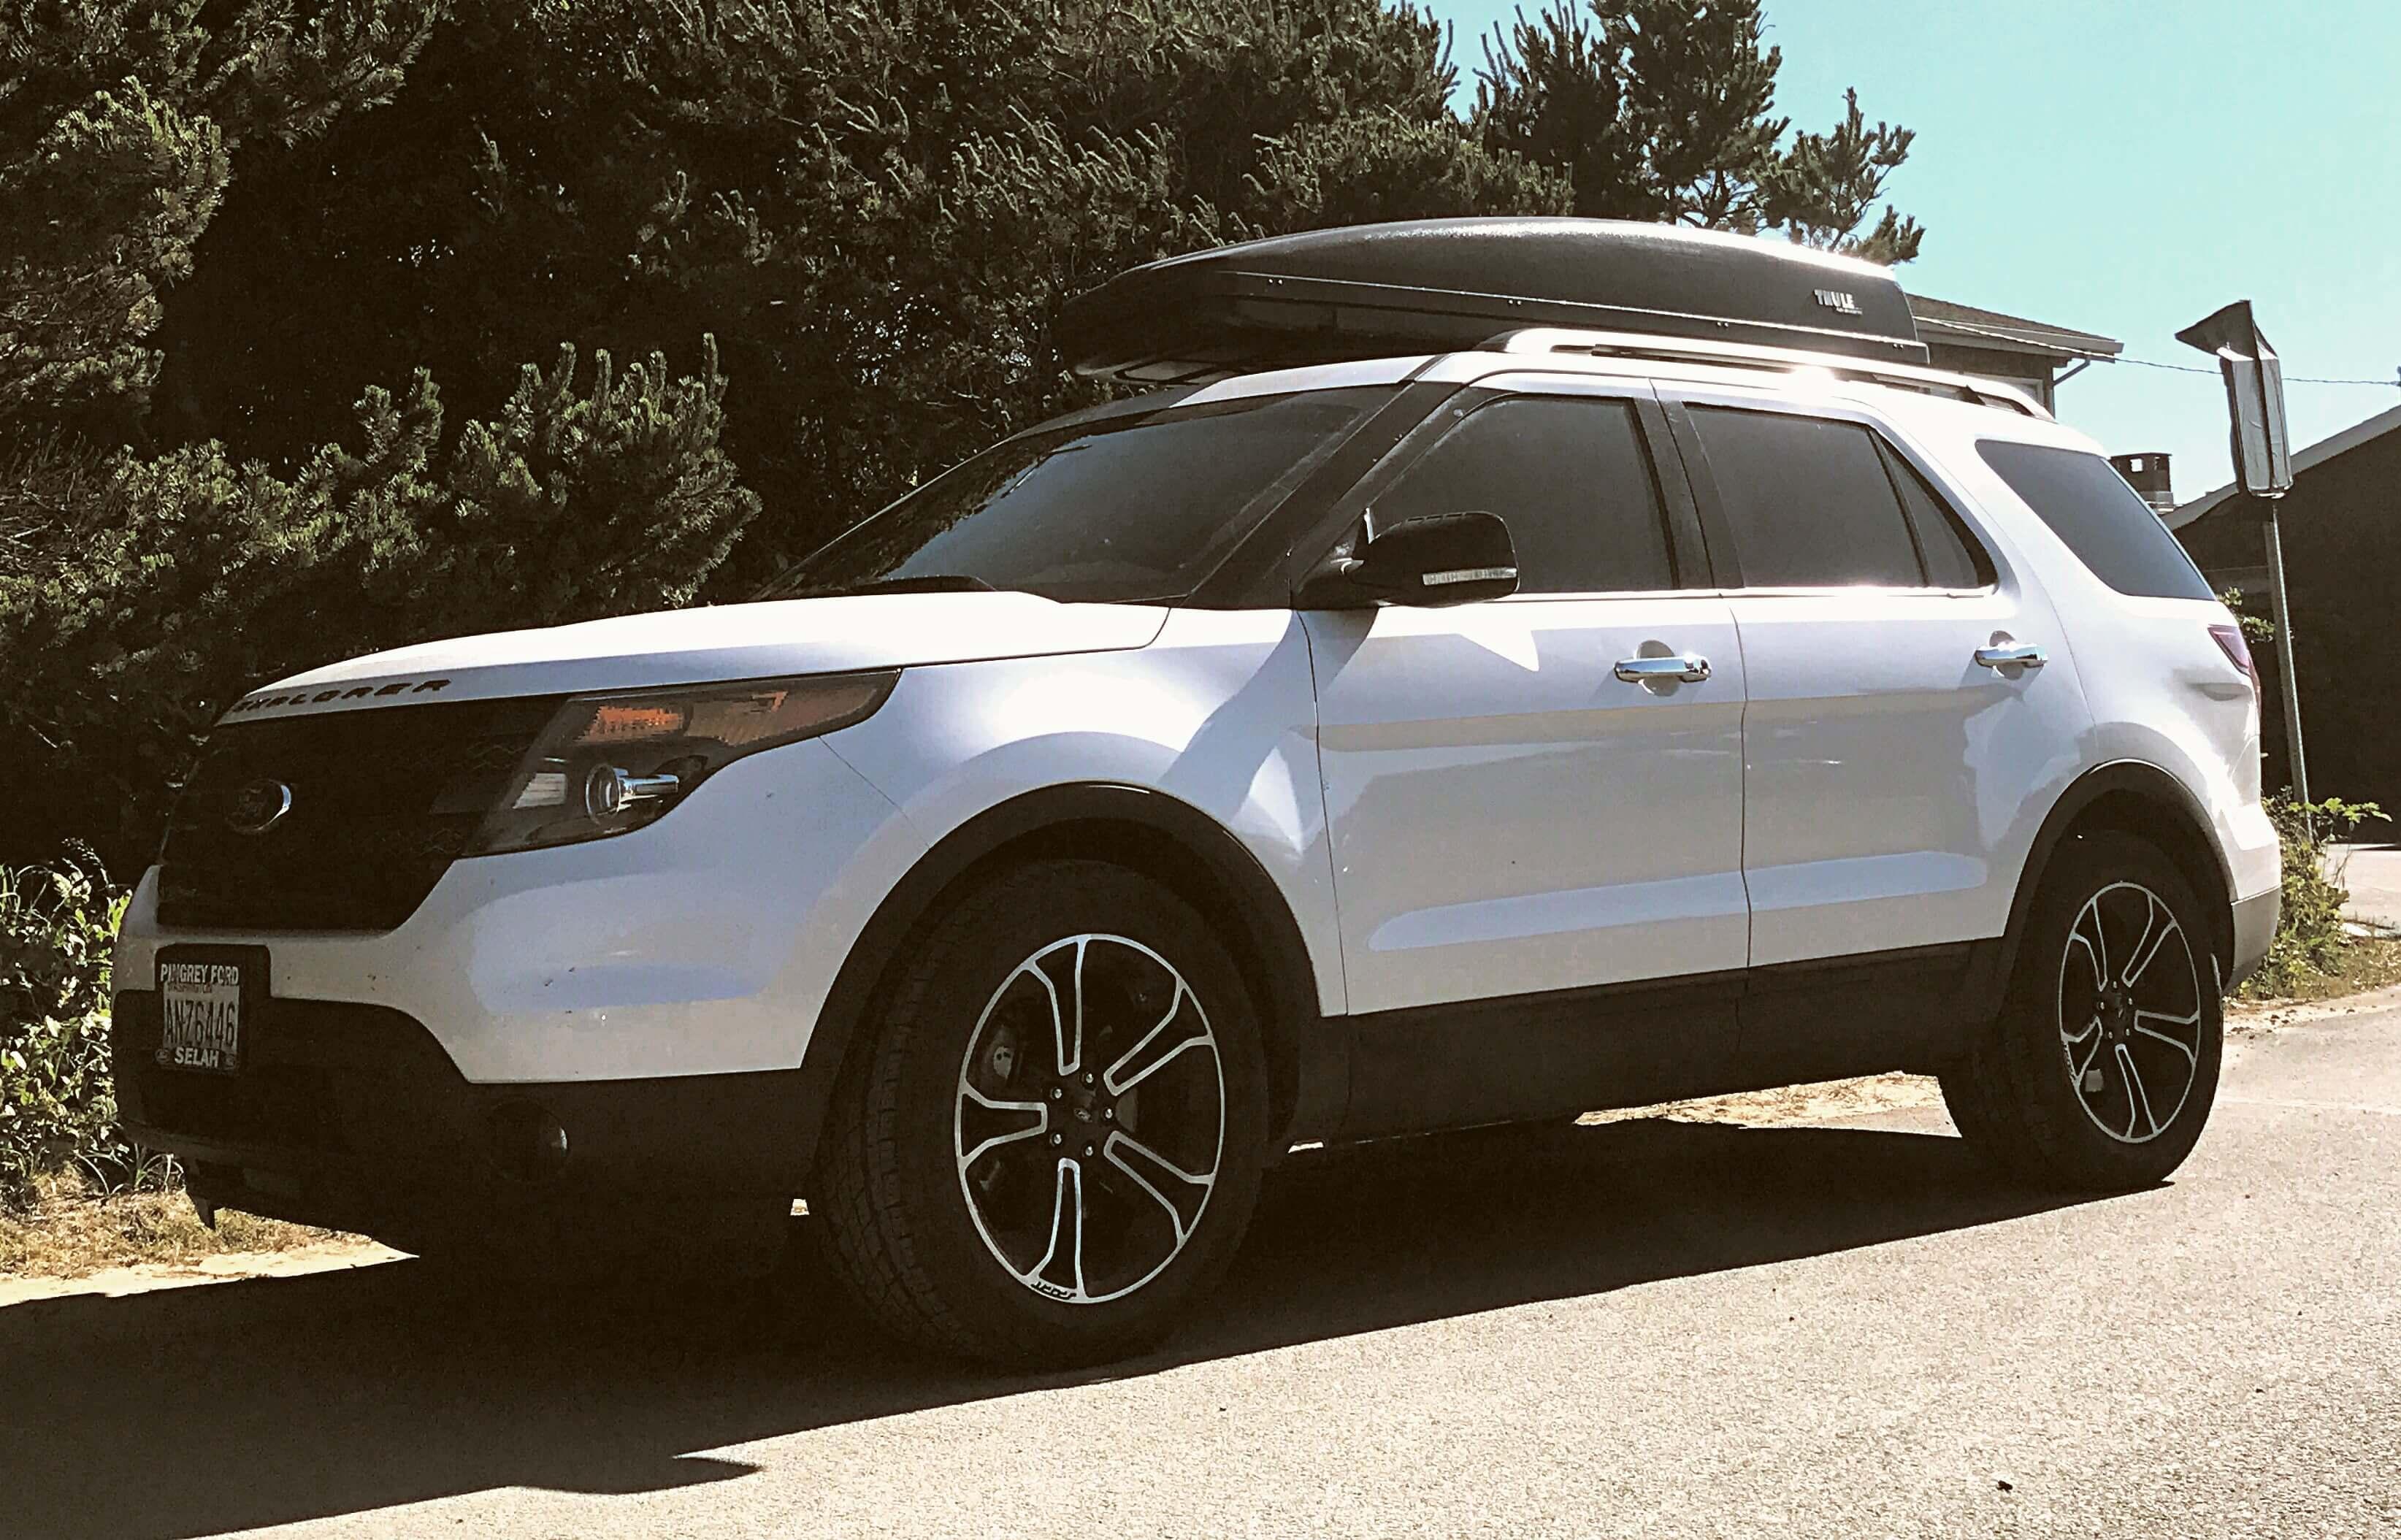 Car Insurance for high risk drivers in Gilbert, AZ